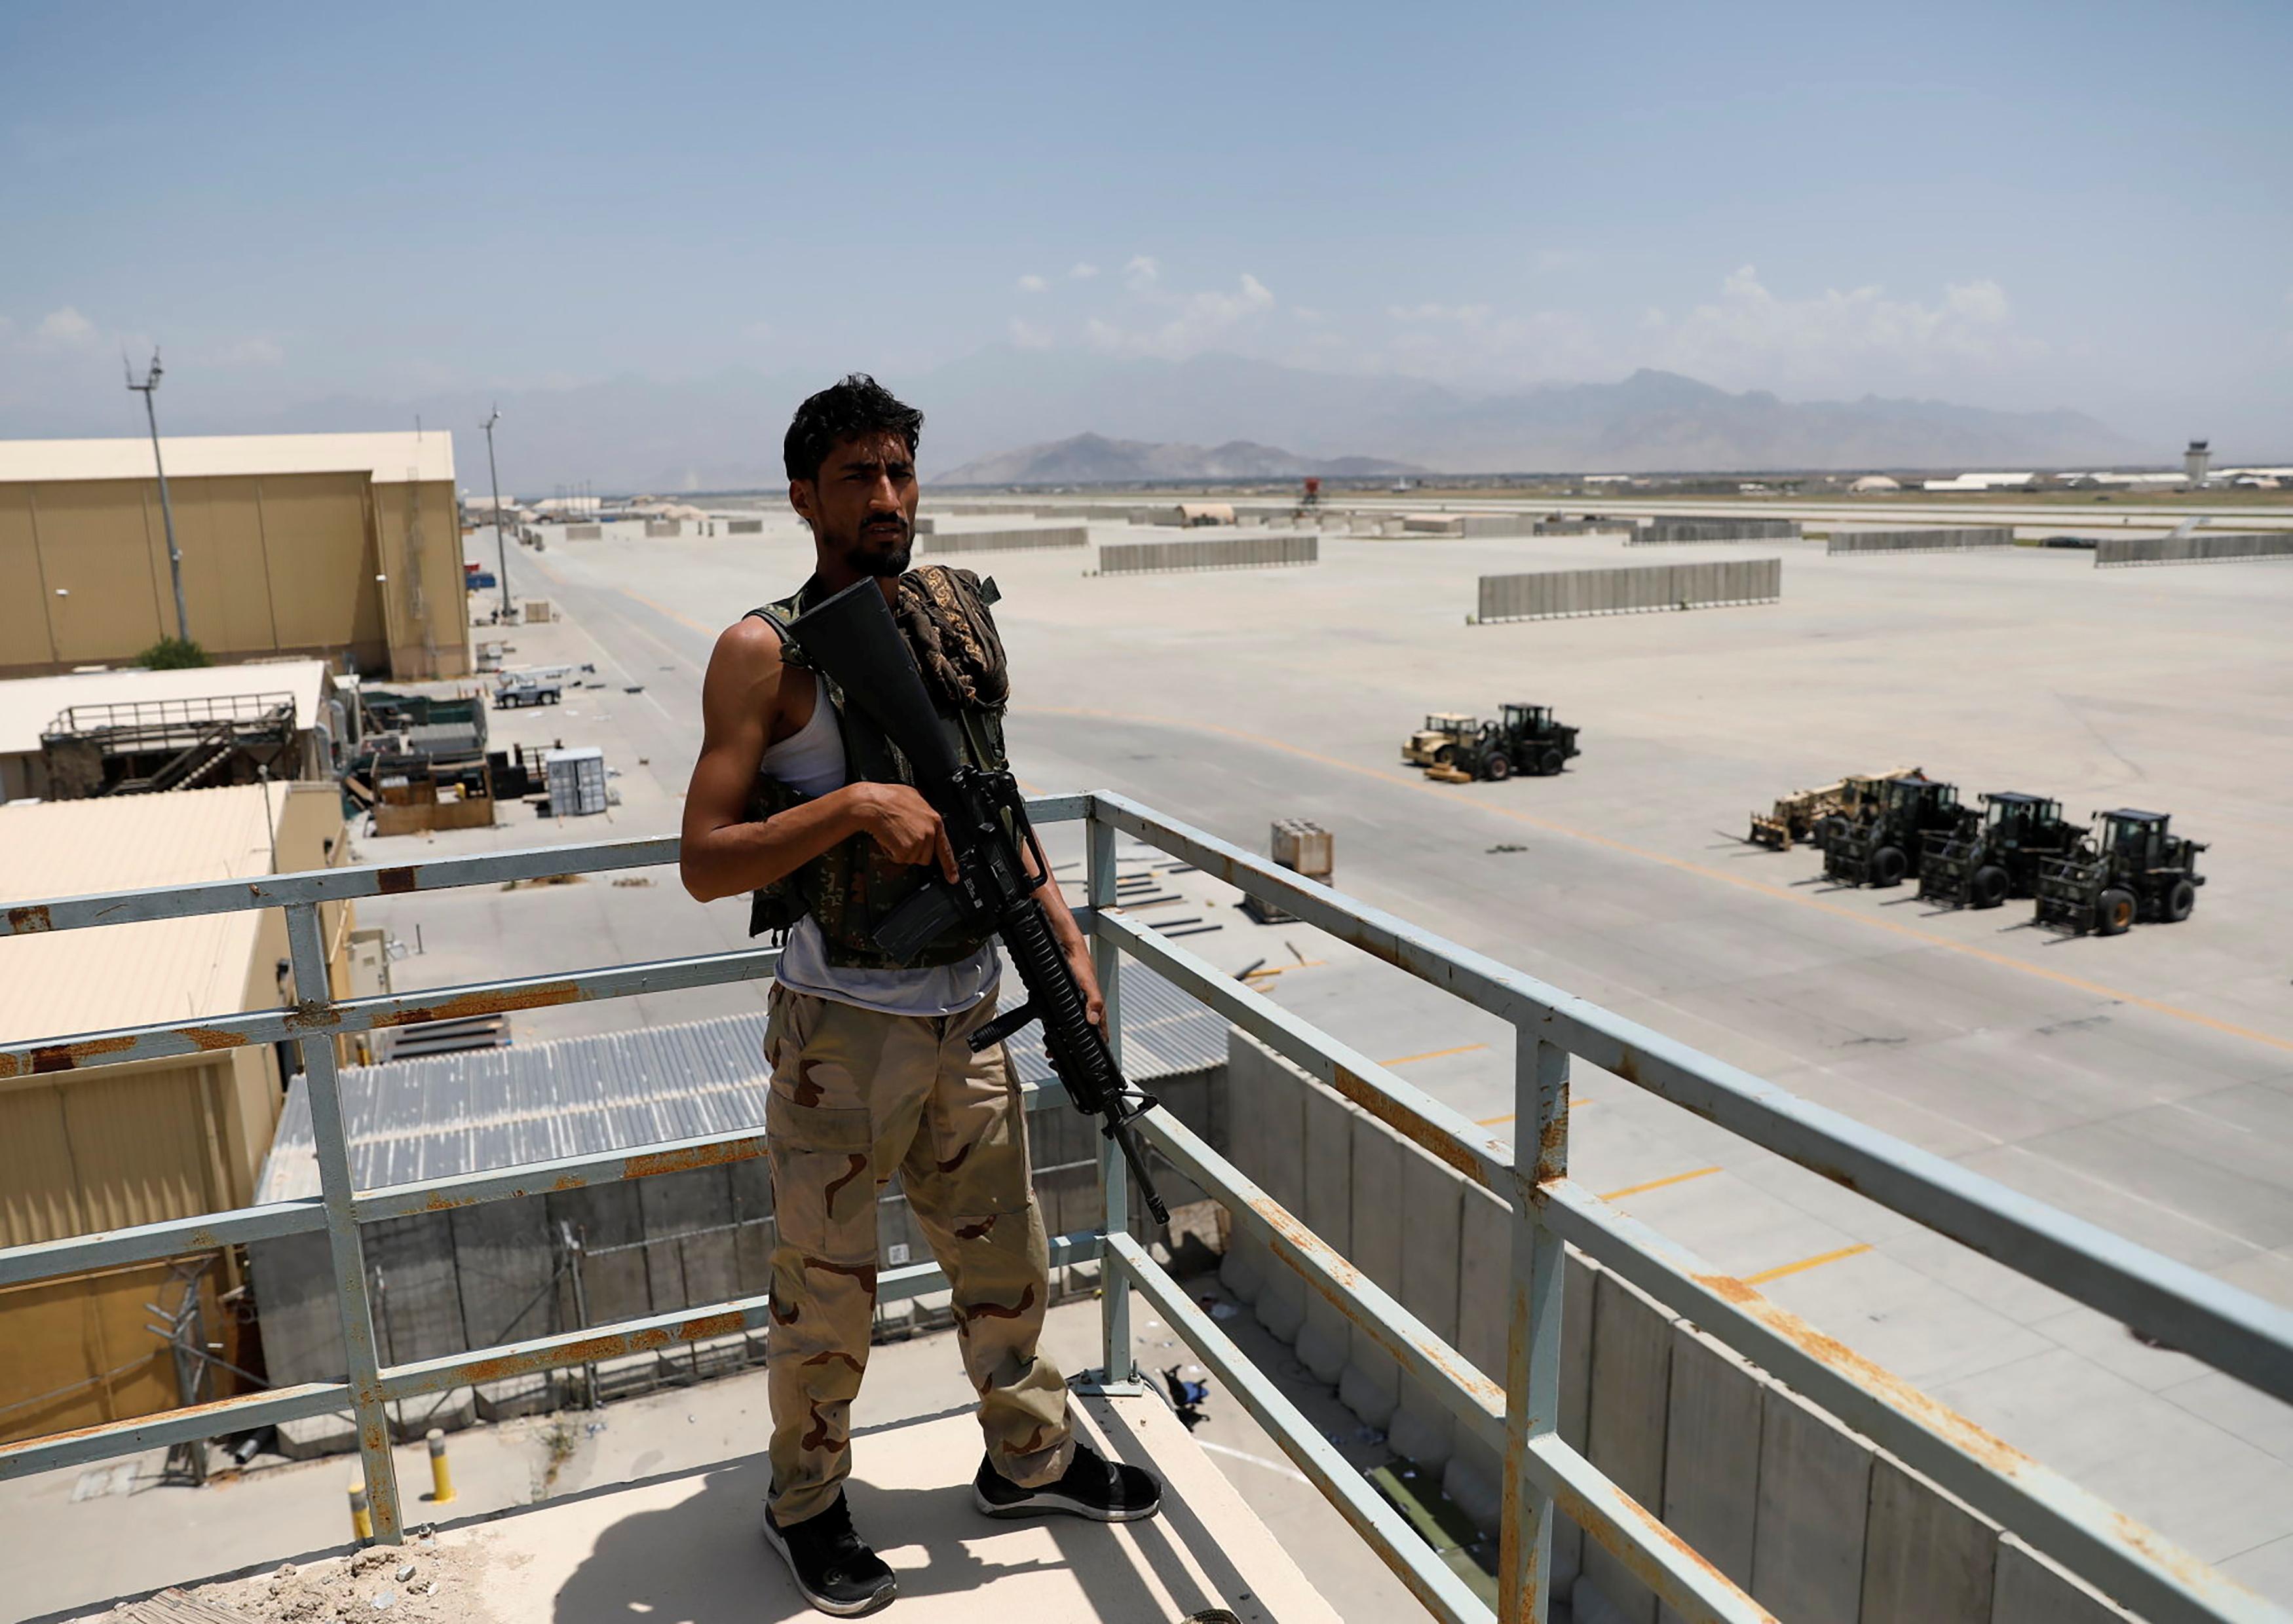 Vacated by Americans, Kabul's Bagram Air Base bustles again as Afghans move  in   Reuters